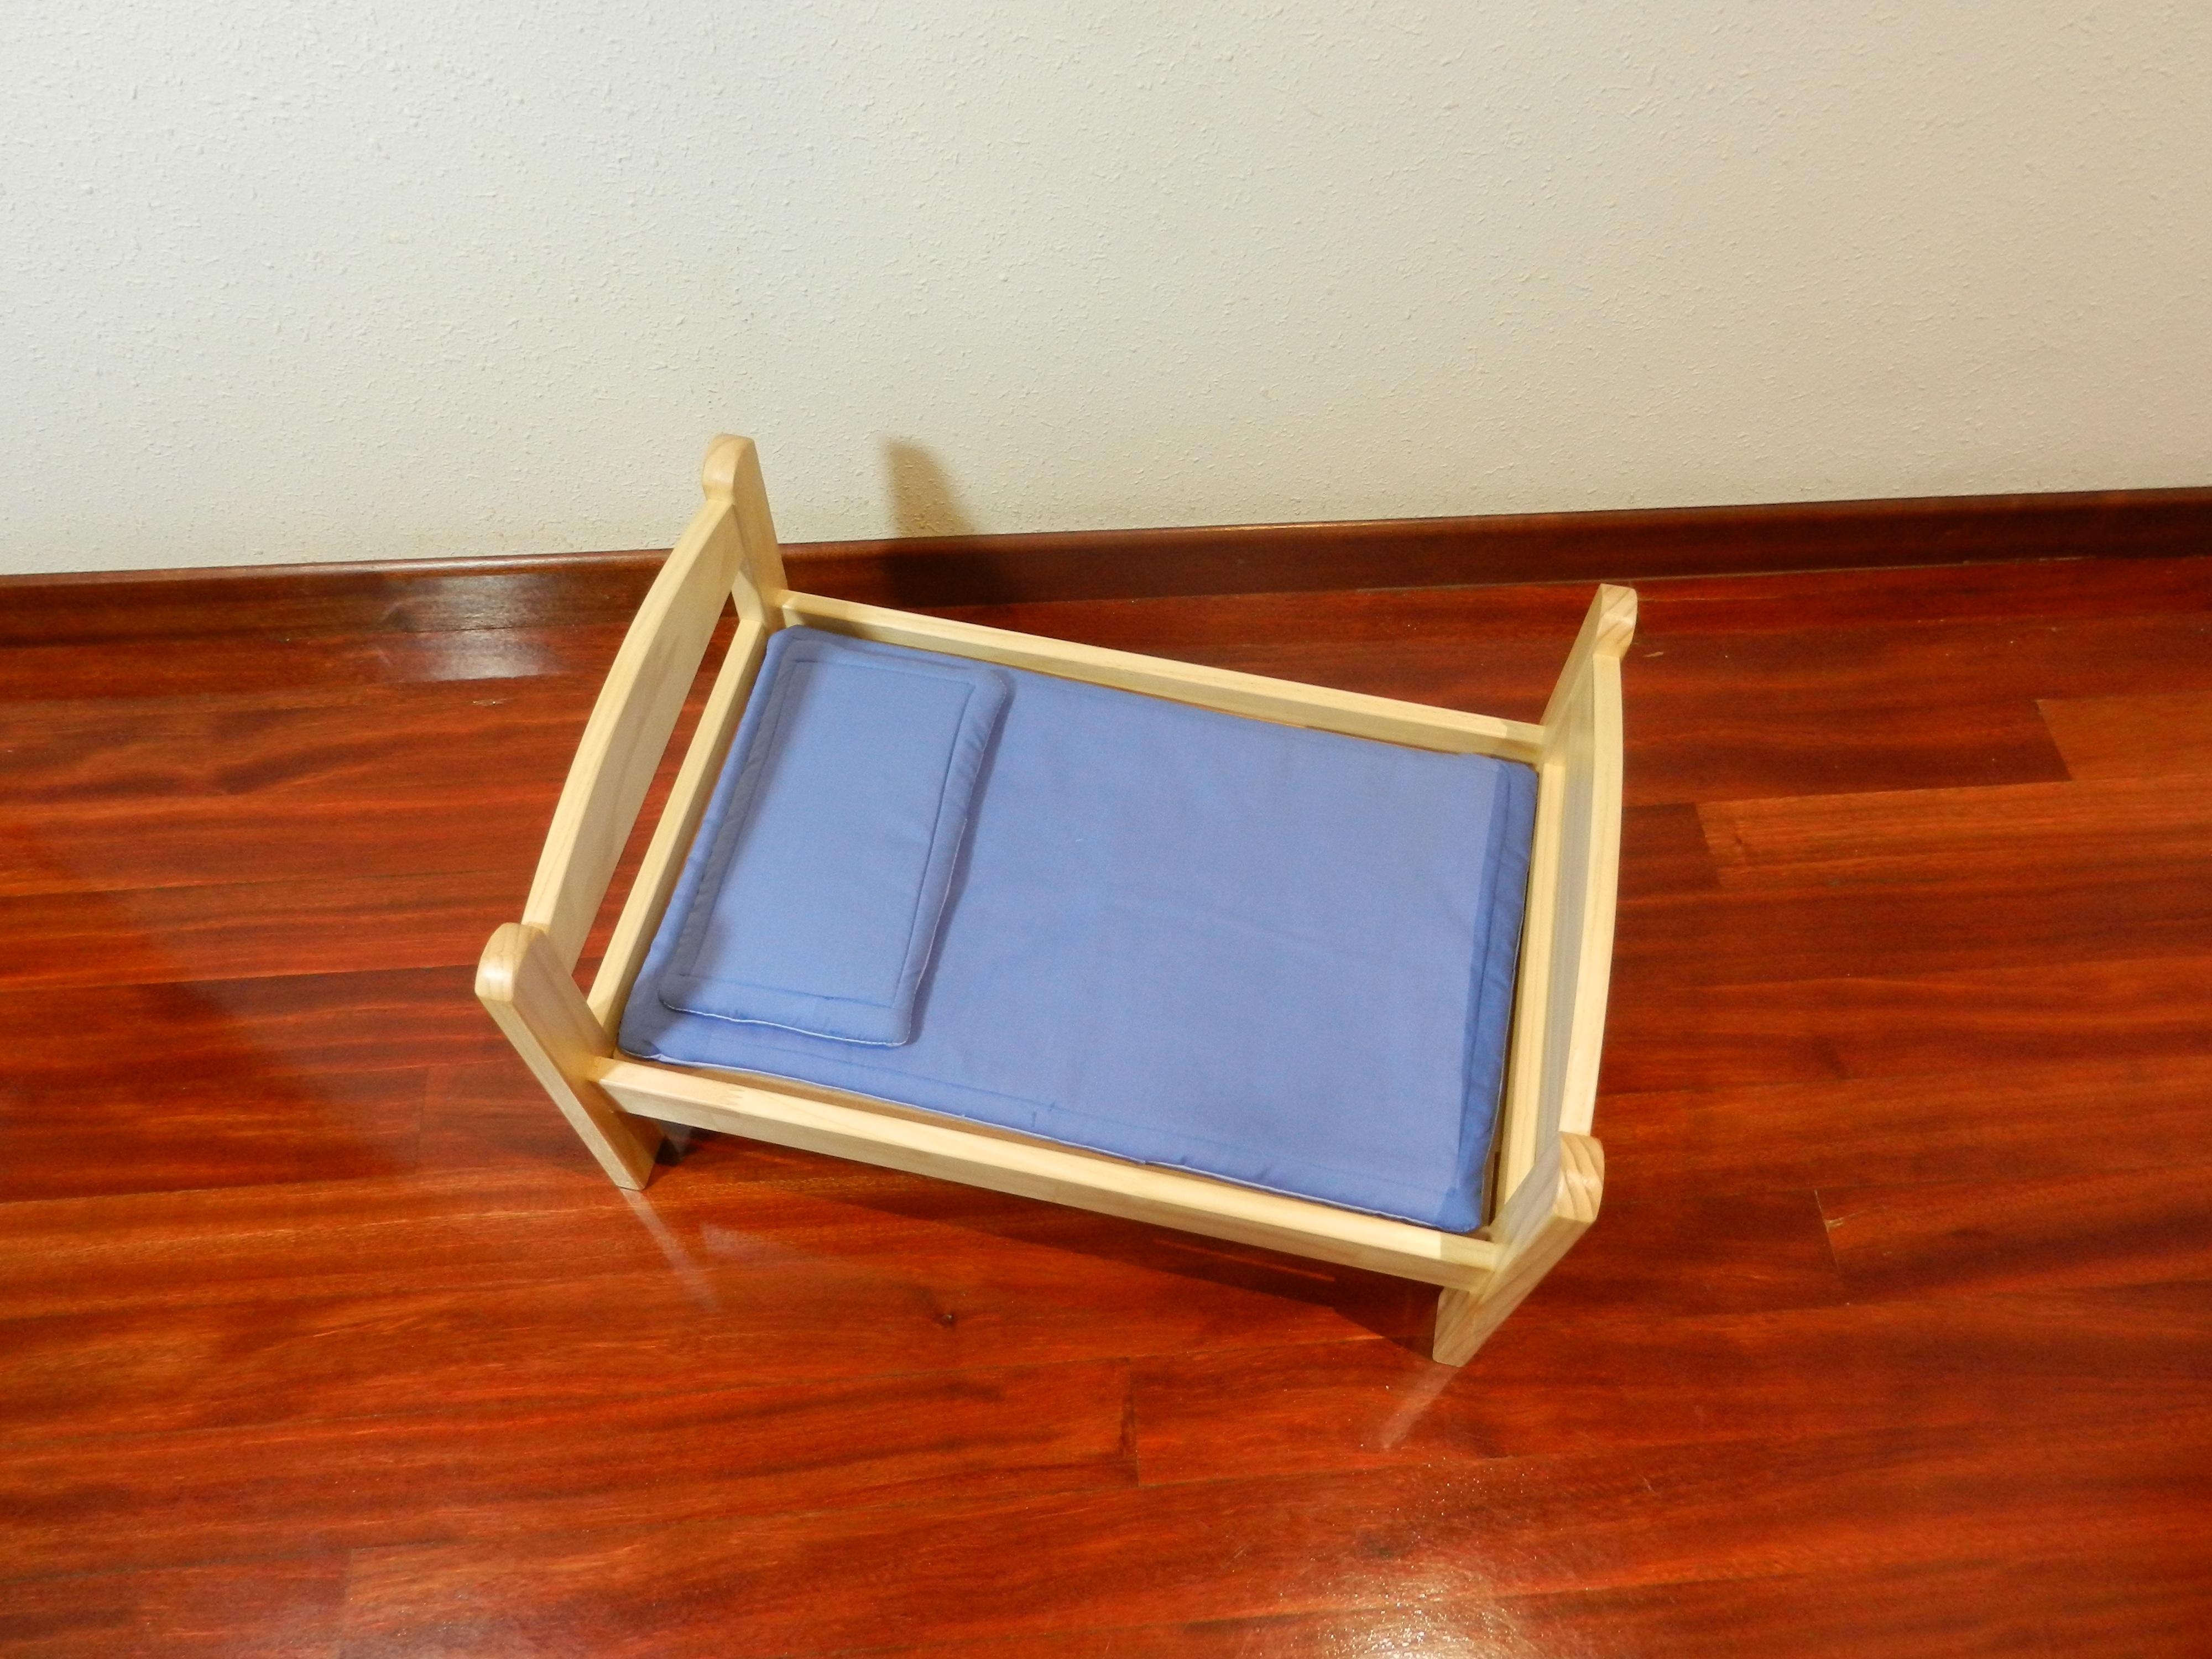 Fotos gratis : mesa, tecnología, piso, mueble, juguete, colchón ...